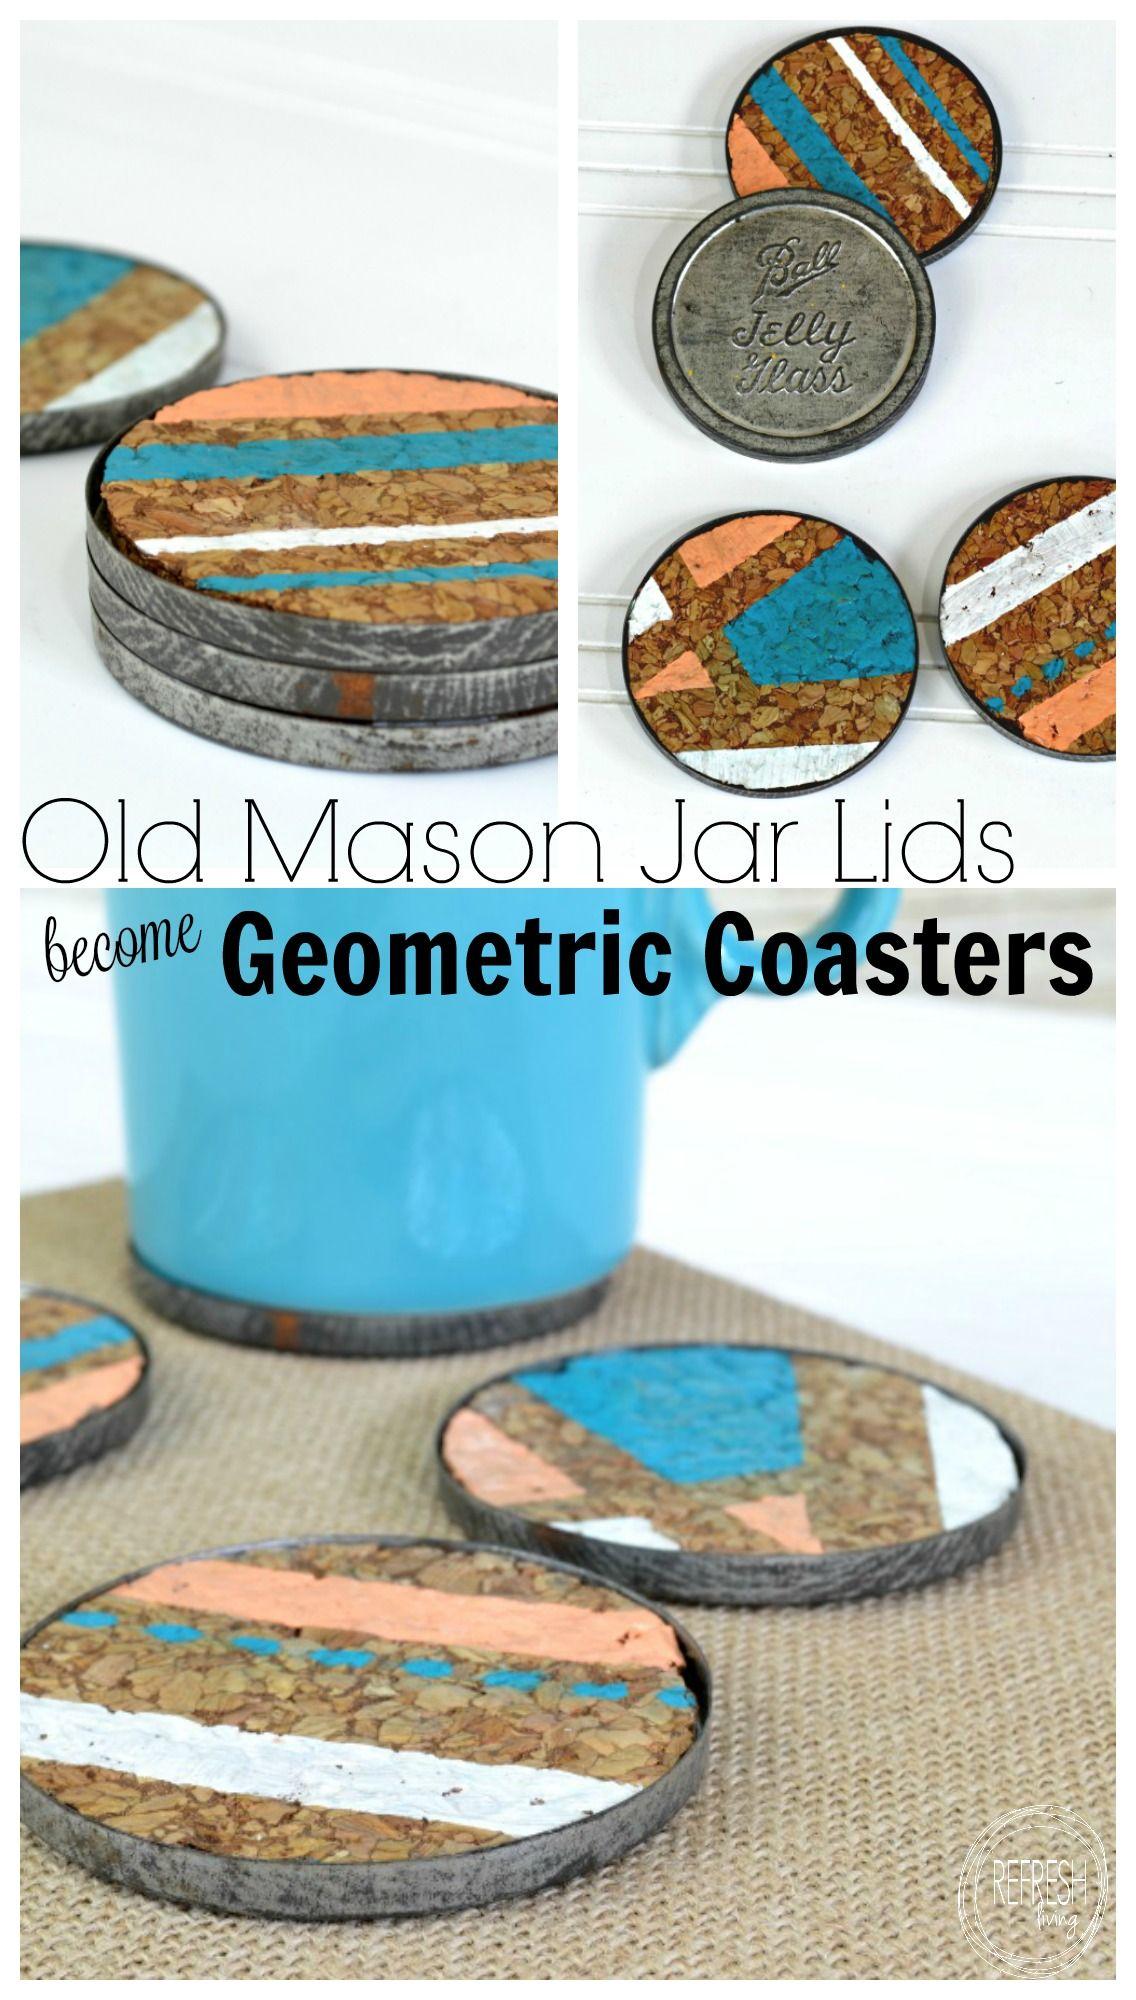 old mason jar lids become diy geometric coasters